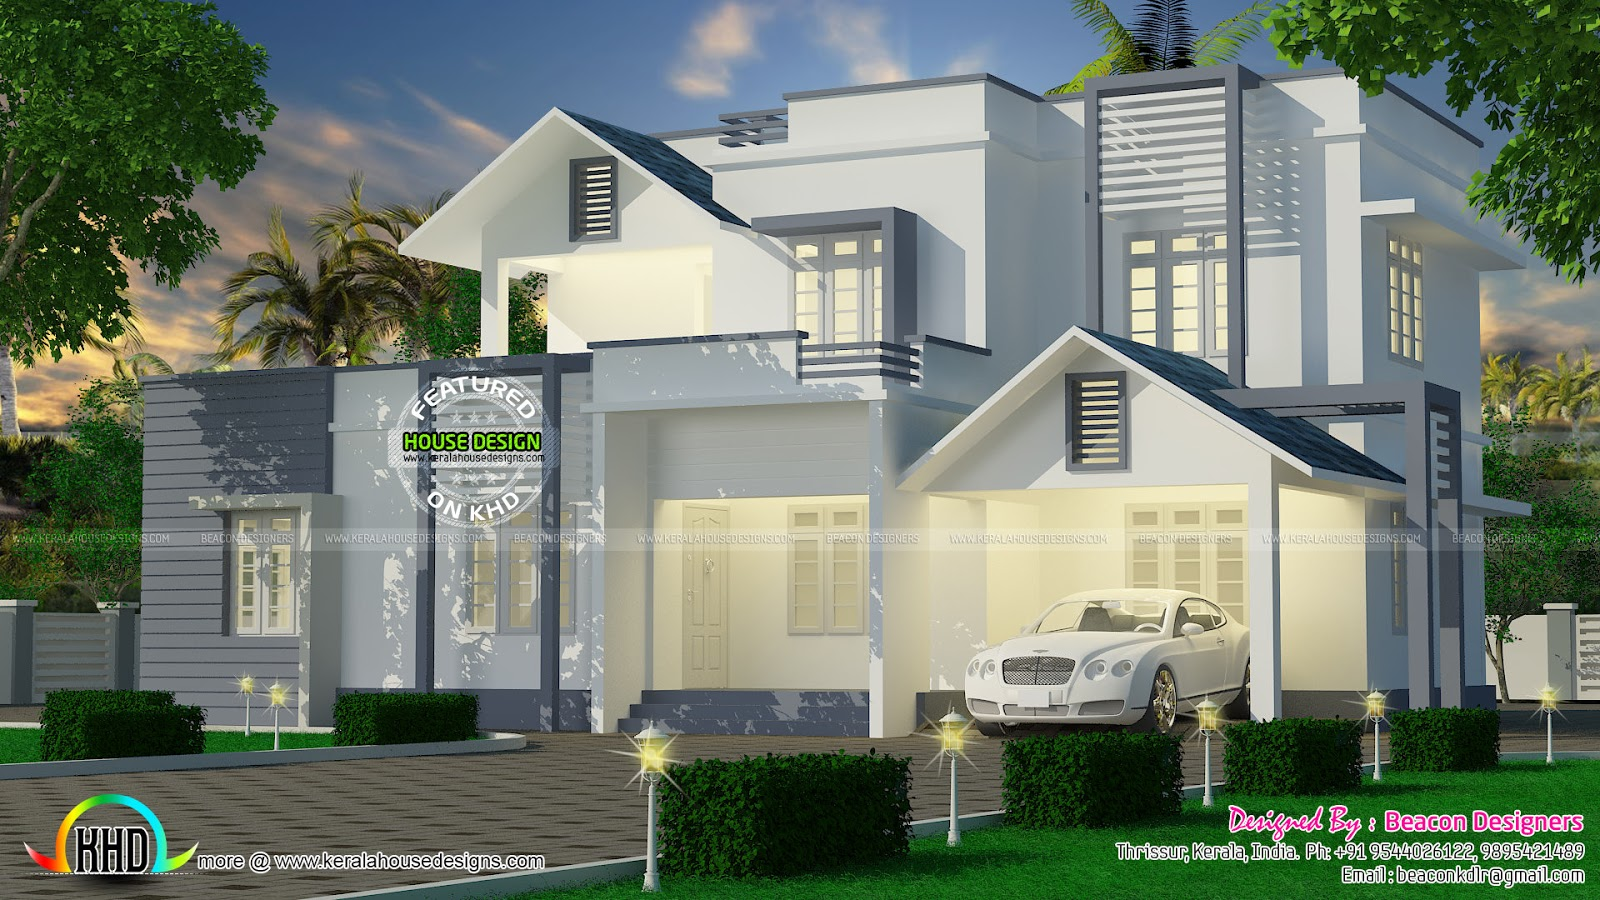 white and grey house design kerala home design and floor plans. Black Bedroom Furniture Sets. Home Design Ideas